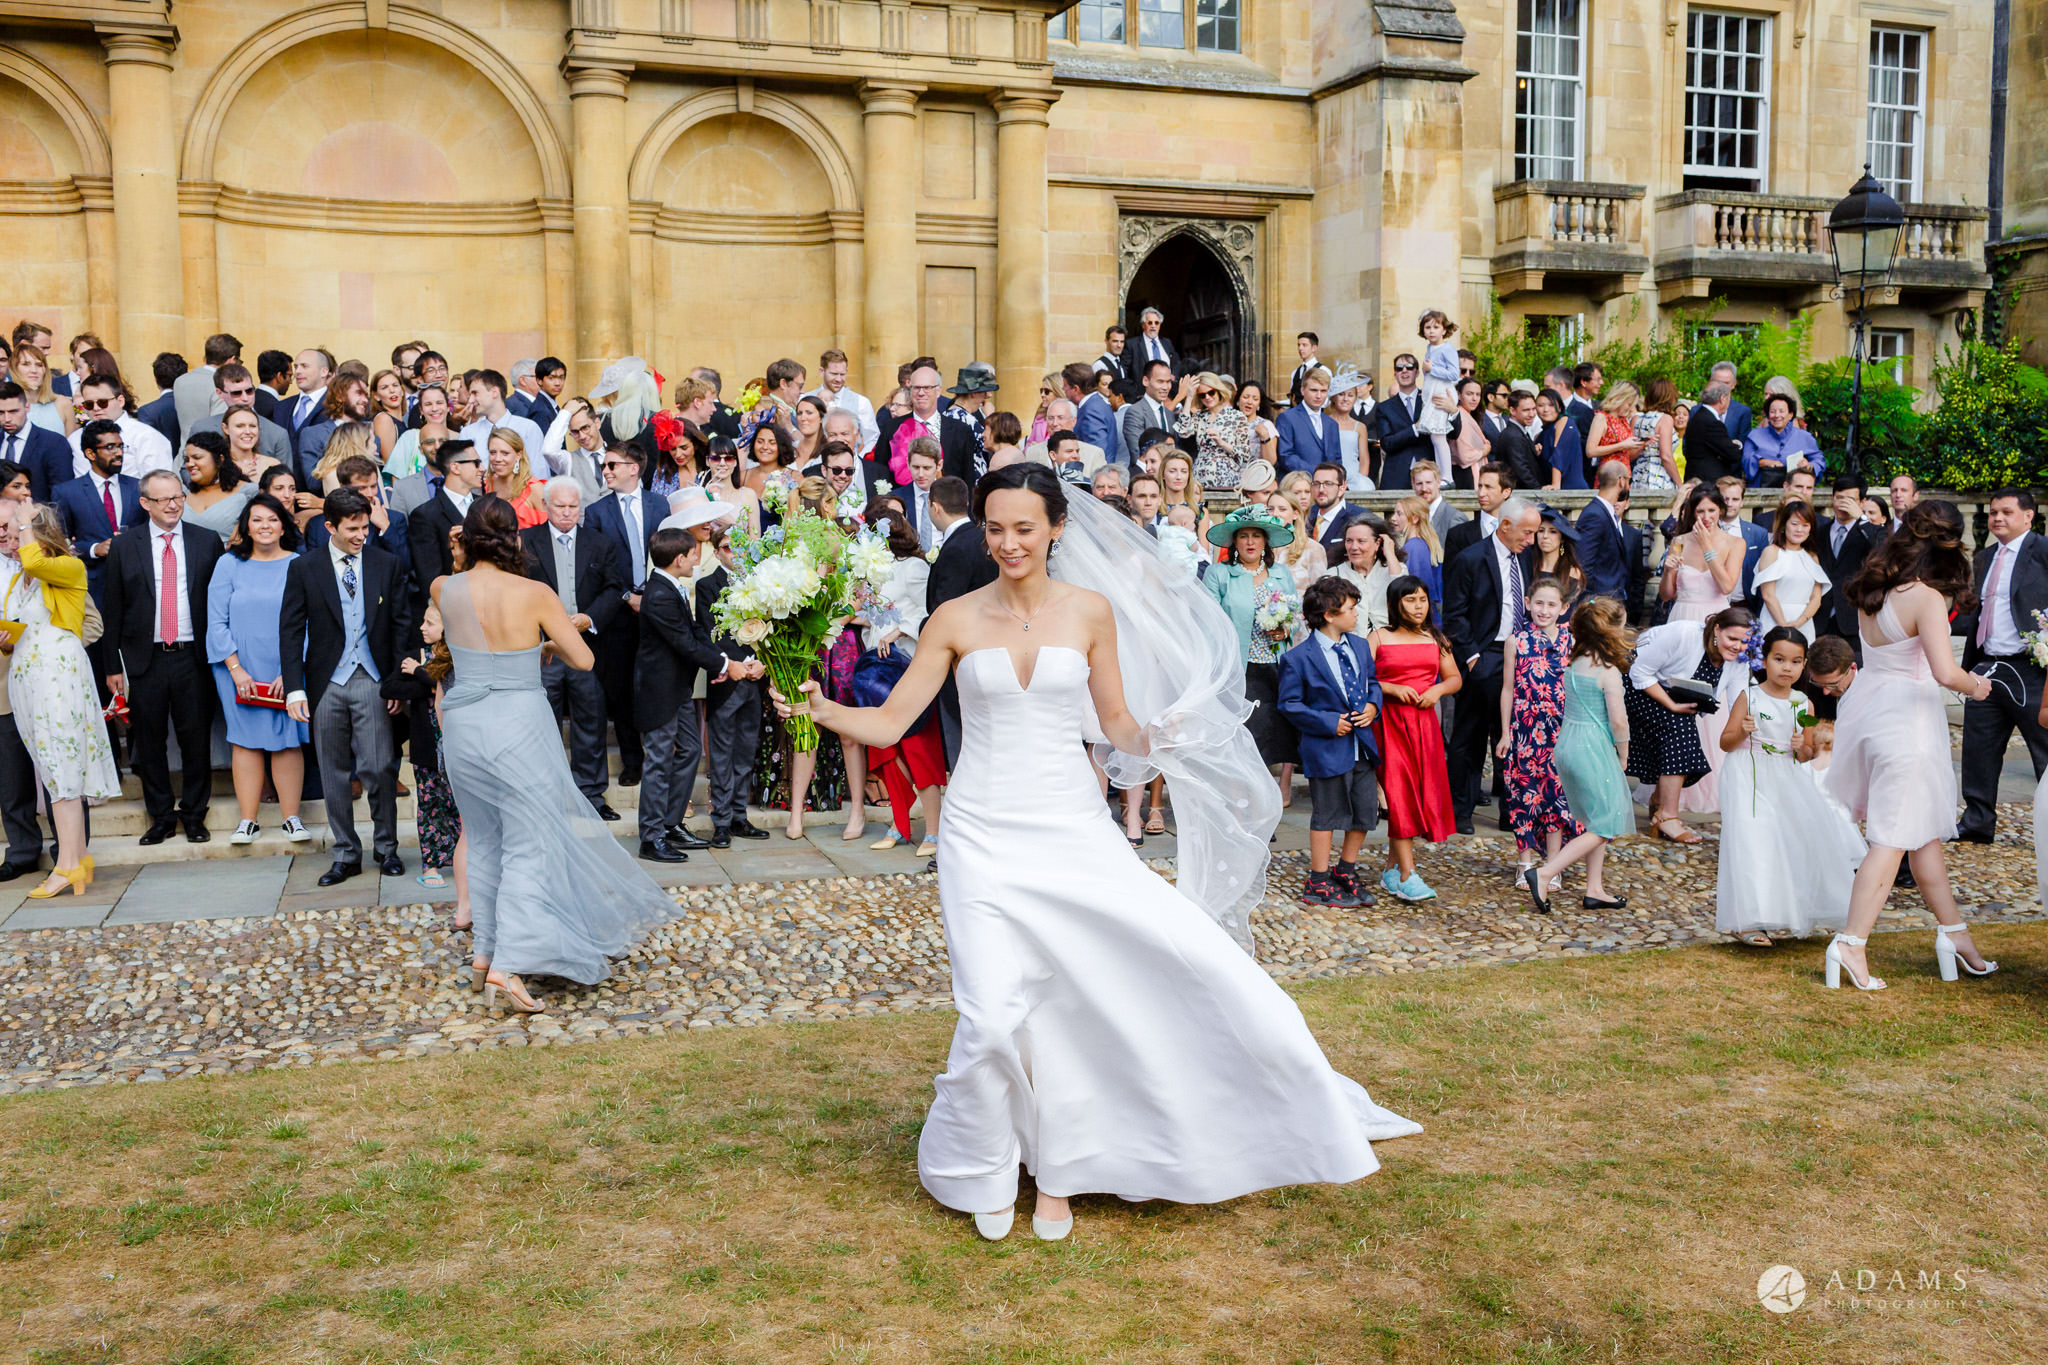 Trinity College Cambridge wedding bride in the wind